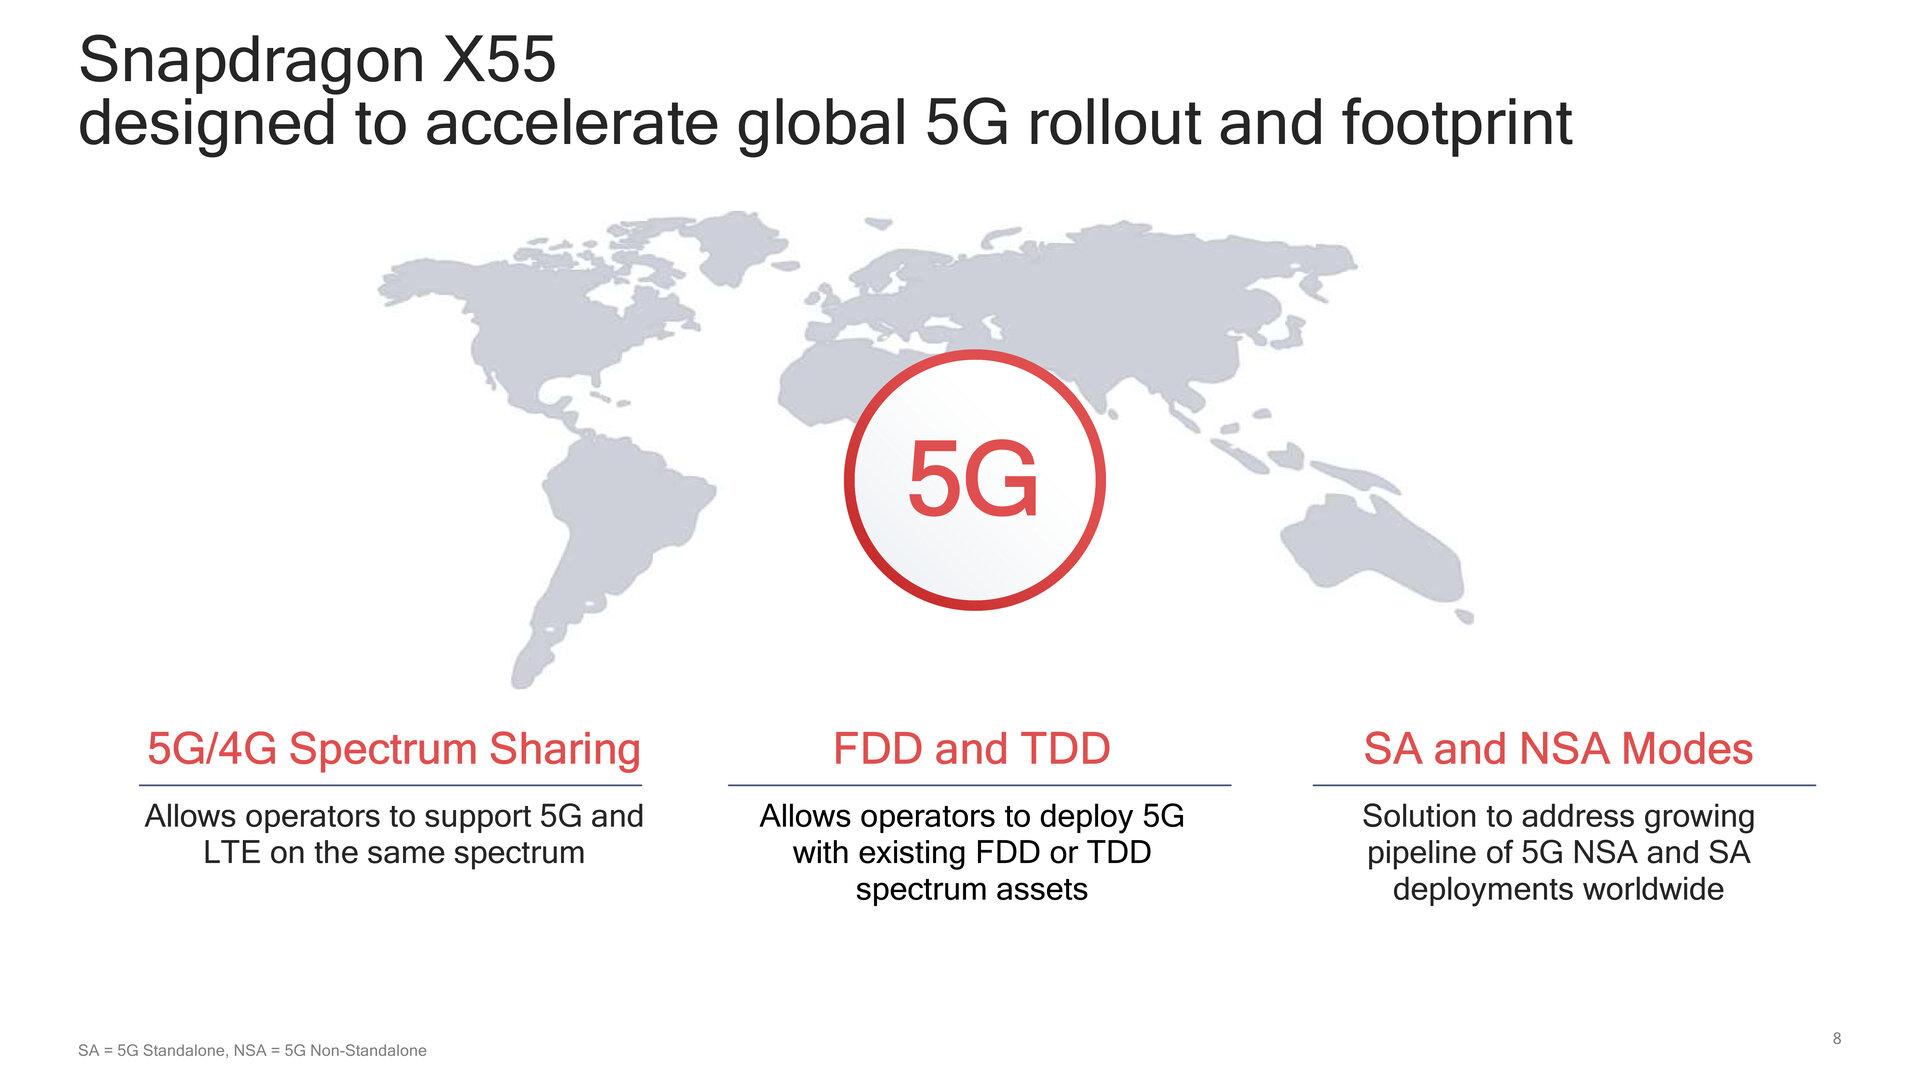 Das Snapdragon X55 soll den globalen 5G-Rollout beschleunigen